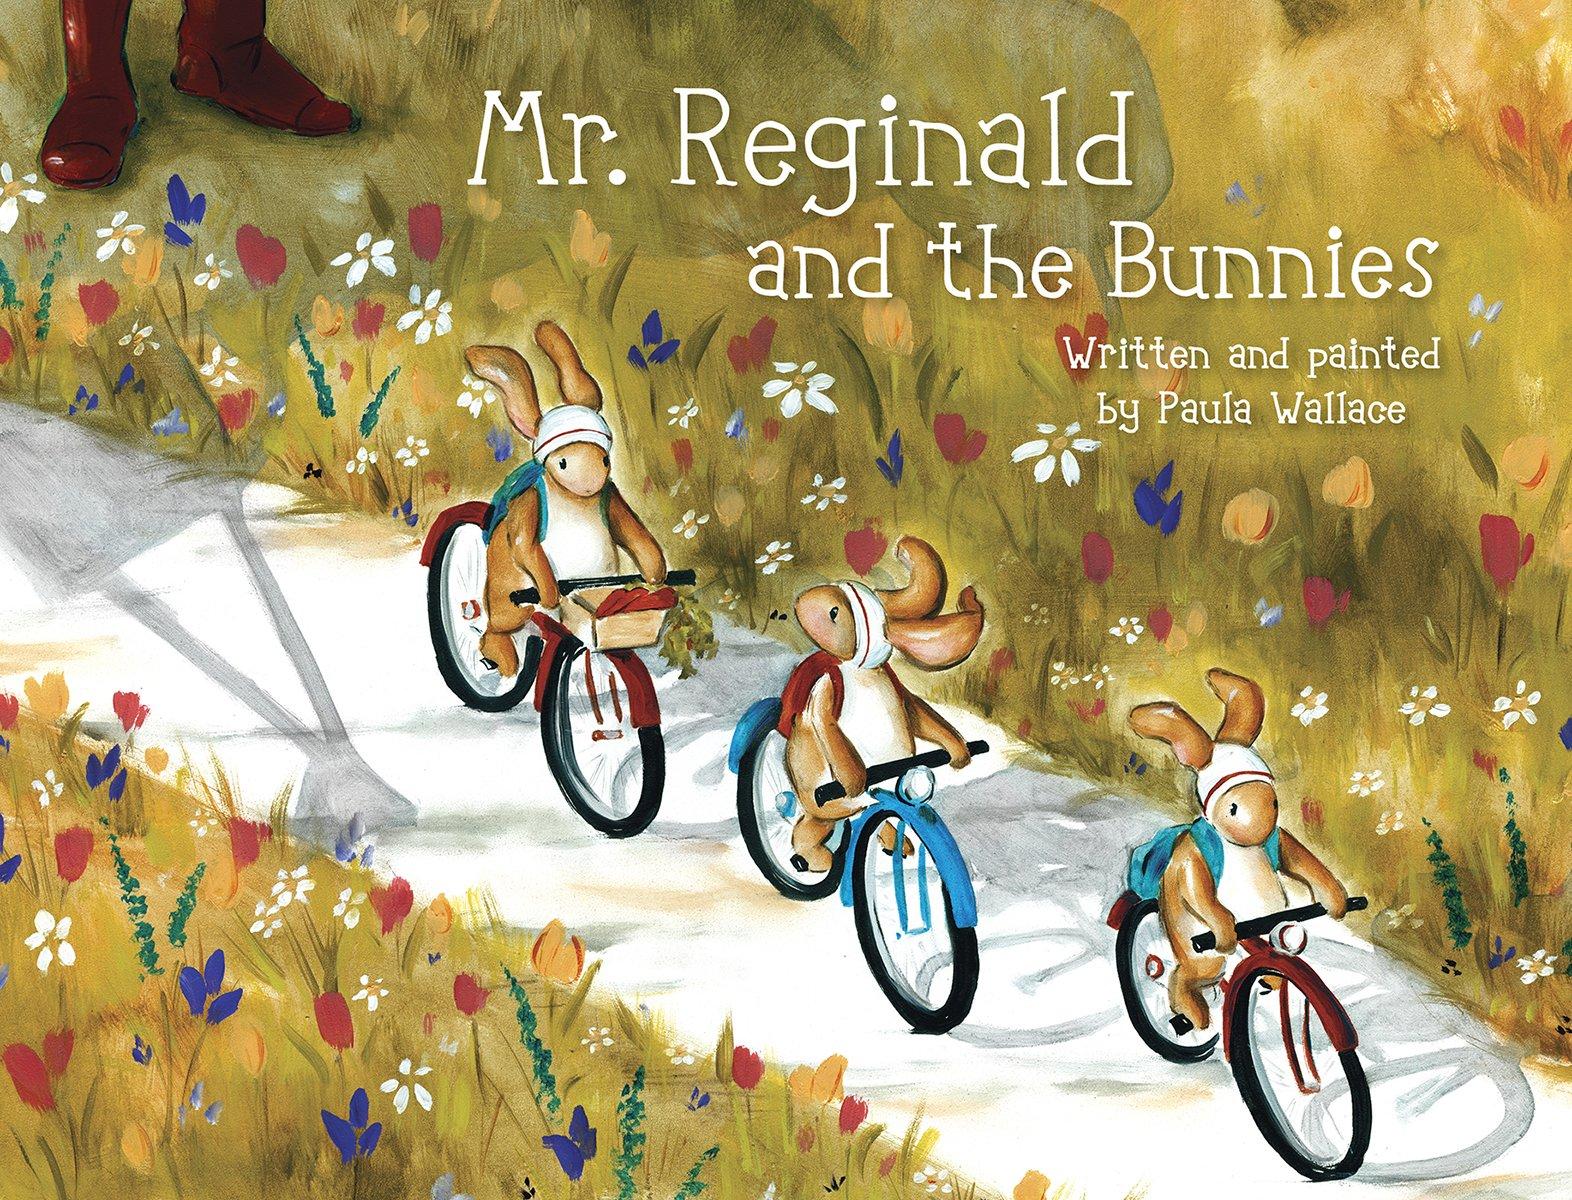 Mr. Reginald and the Bunnies